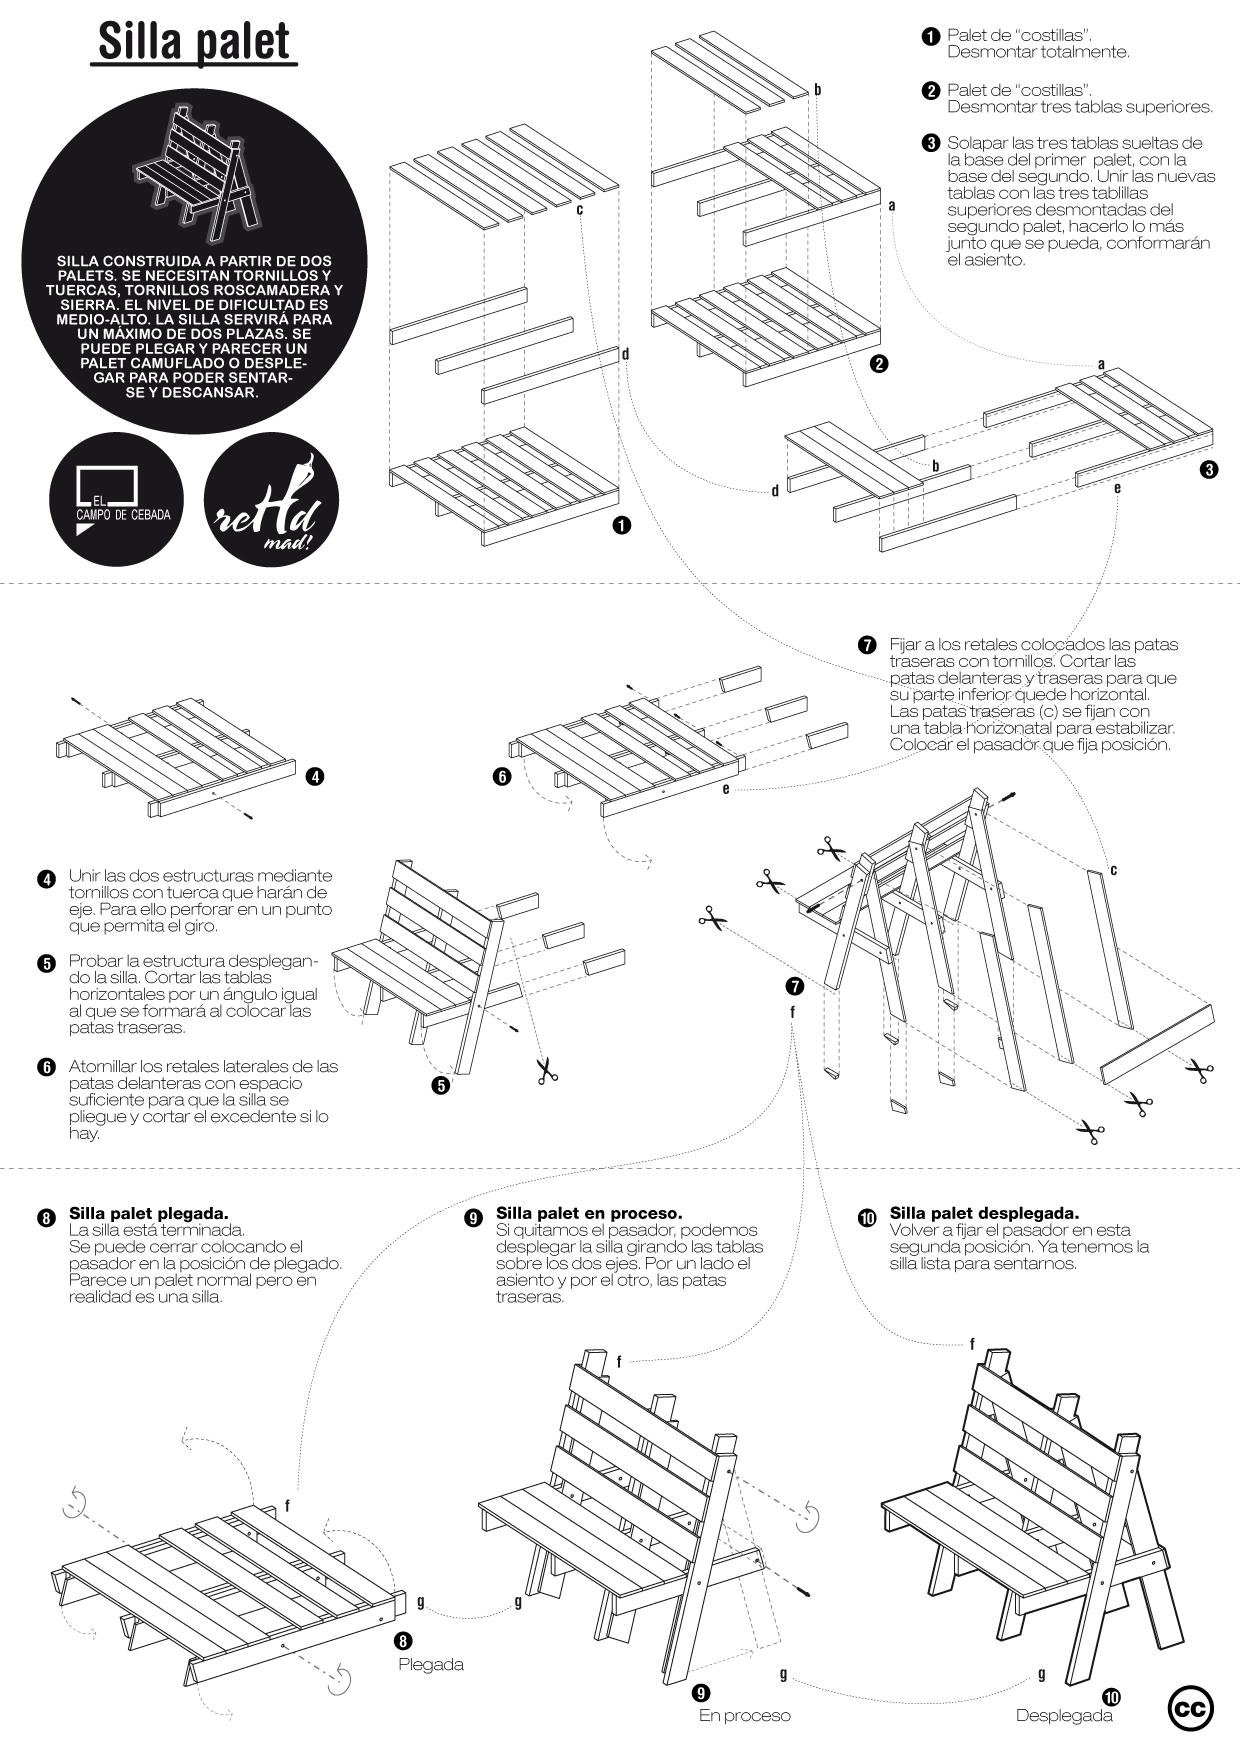 Planos de diferentes muebles hechos con palets muy ingenioso - Como hacer un sillon paso a paso ...